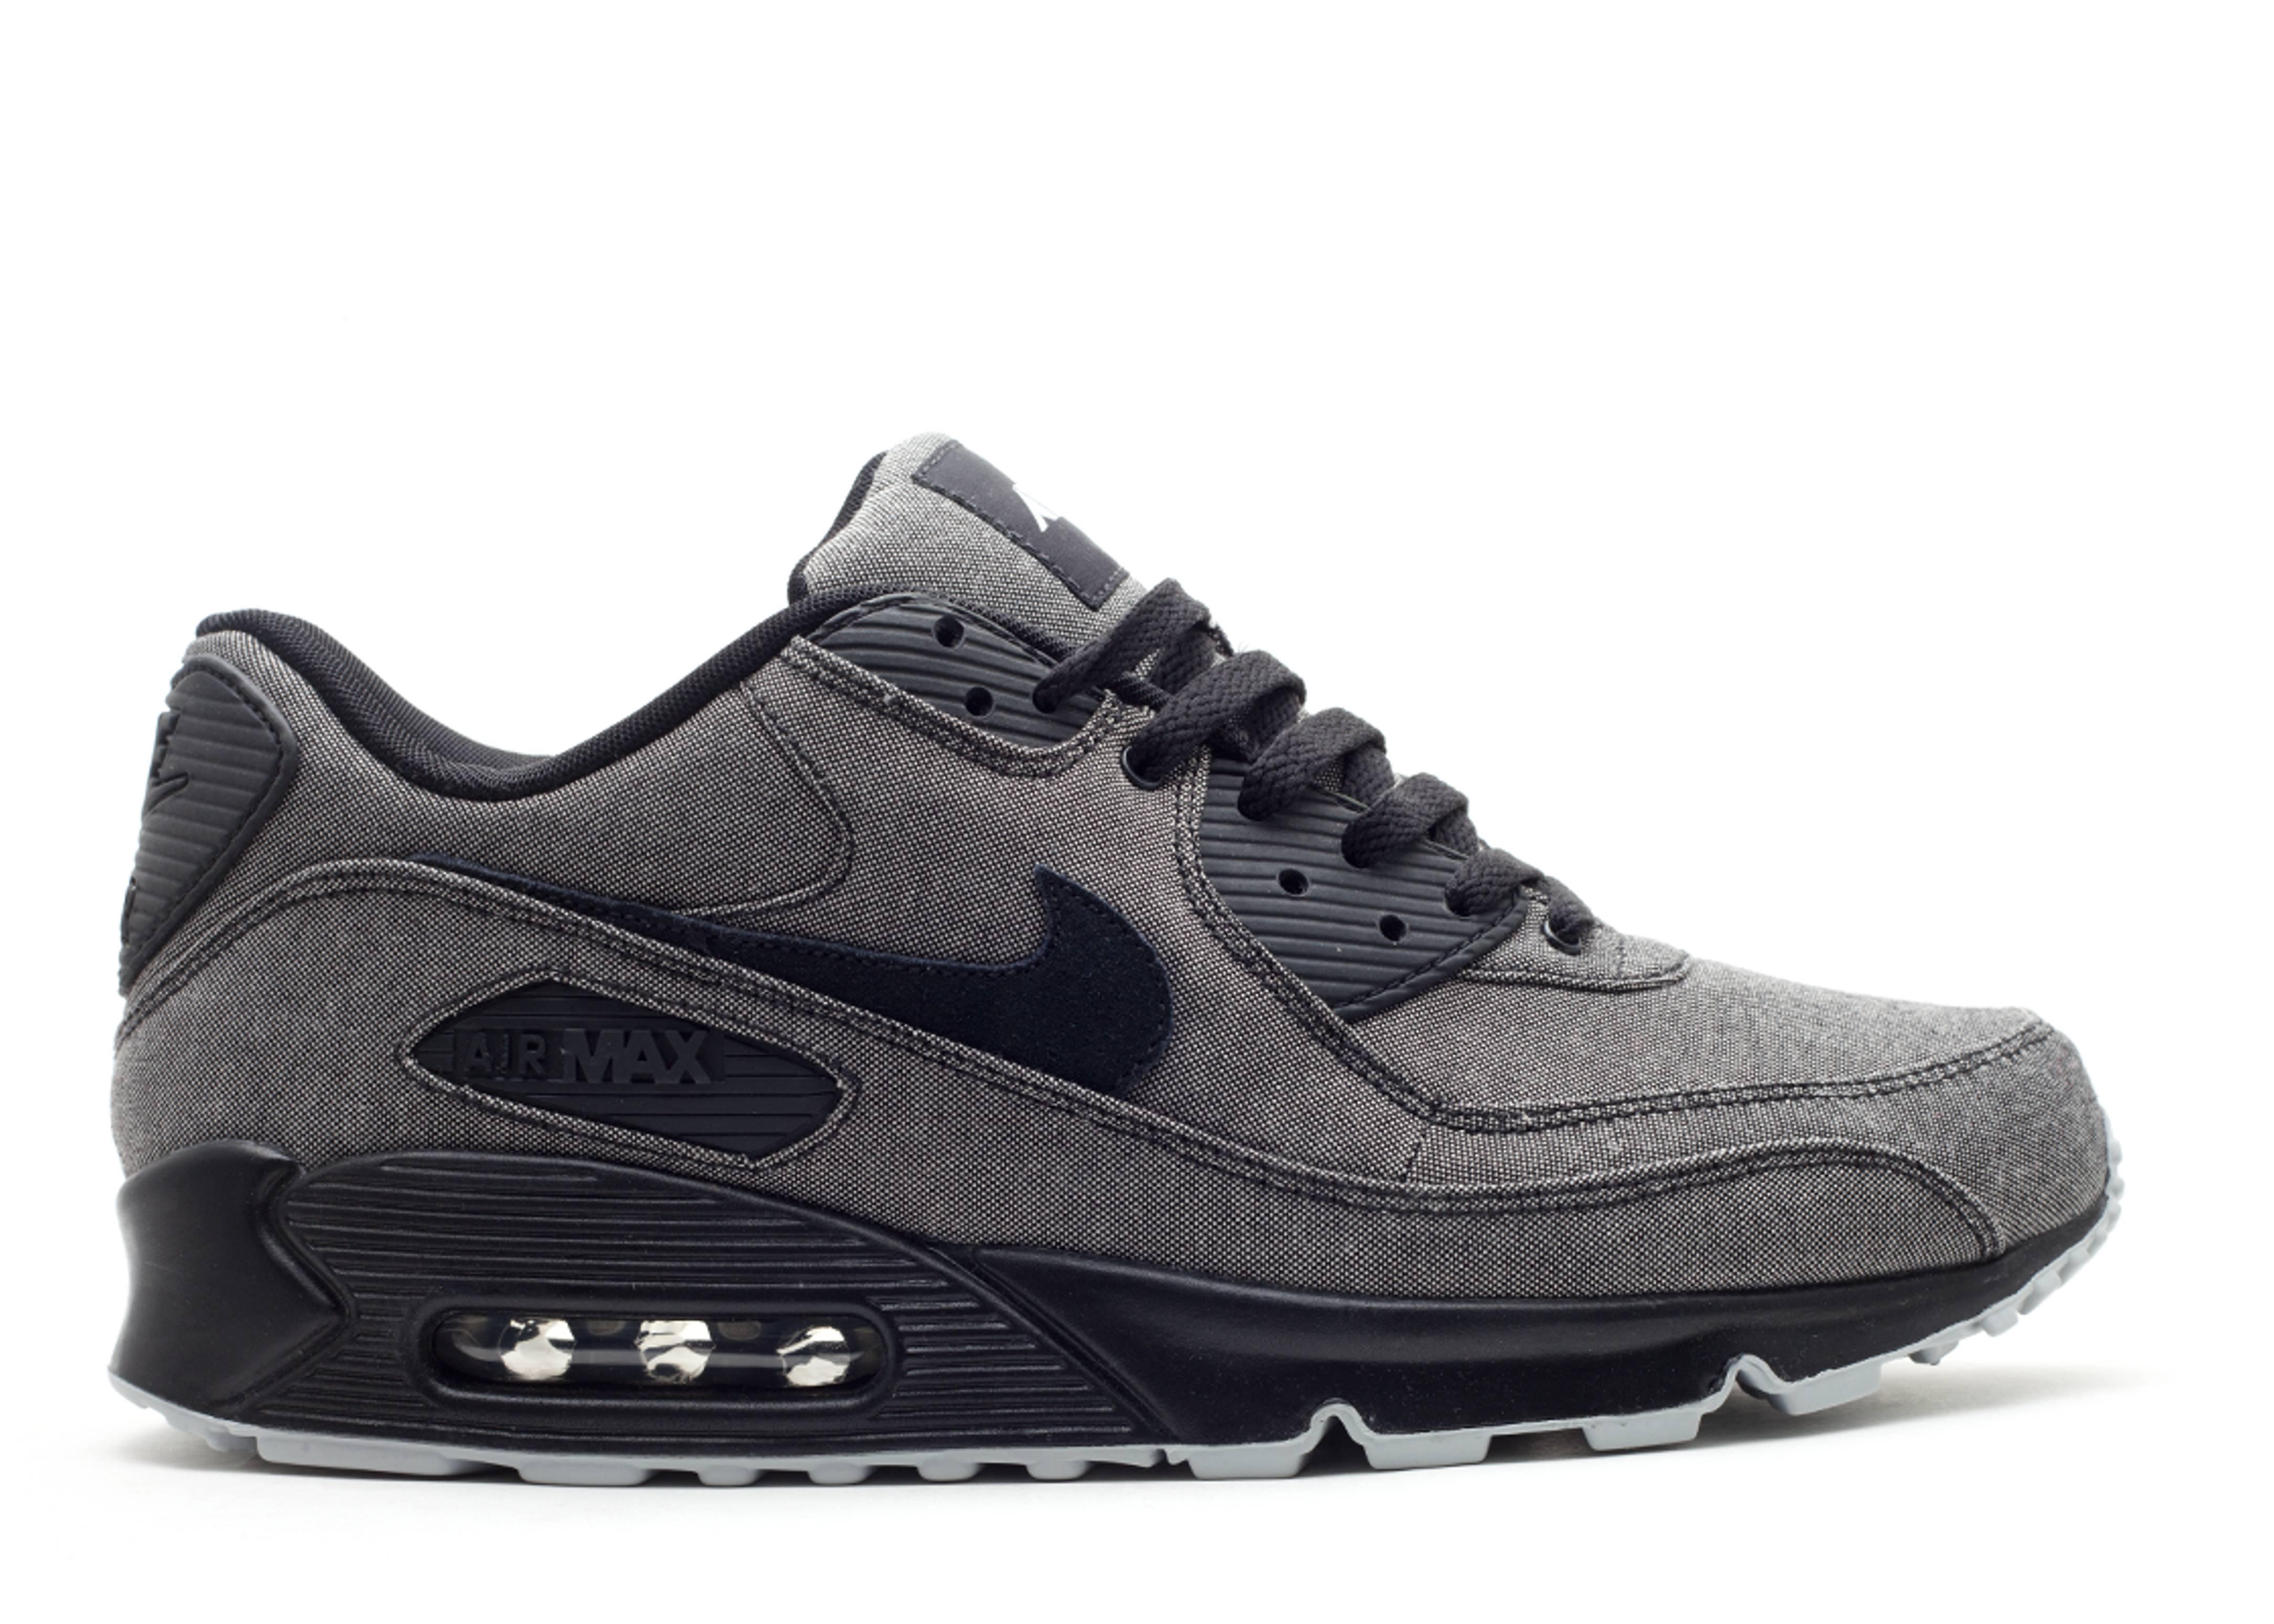 wholesale dealer 1da54 7f3a3 Air Max 90 - Nike - 325018 007 - black black-metallic silver   Flight Club